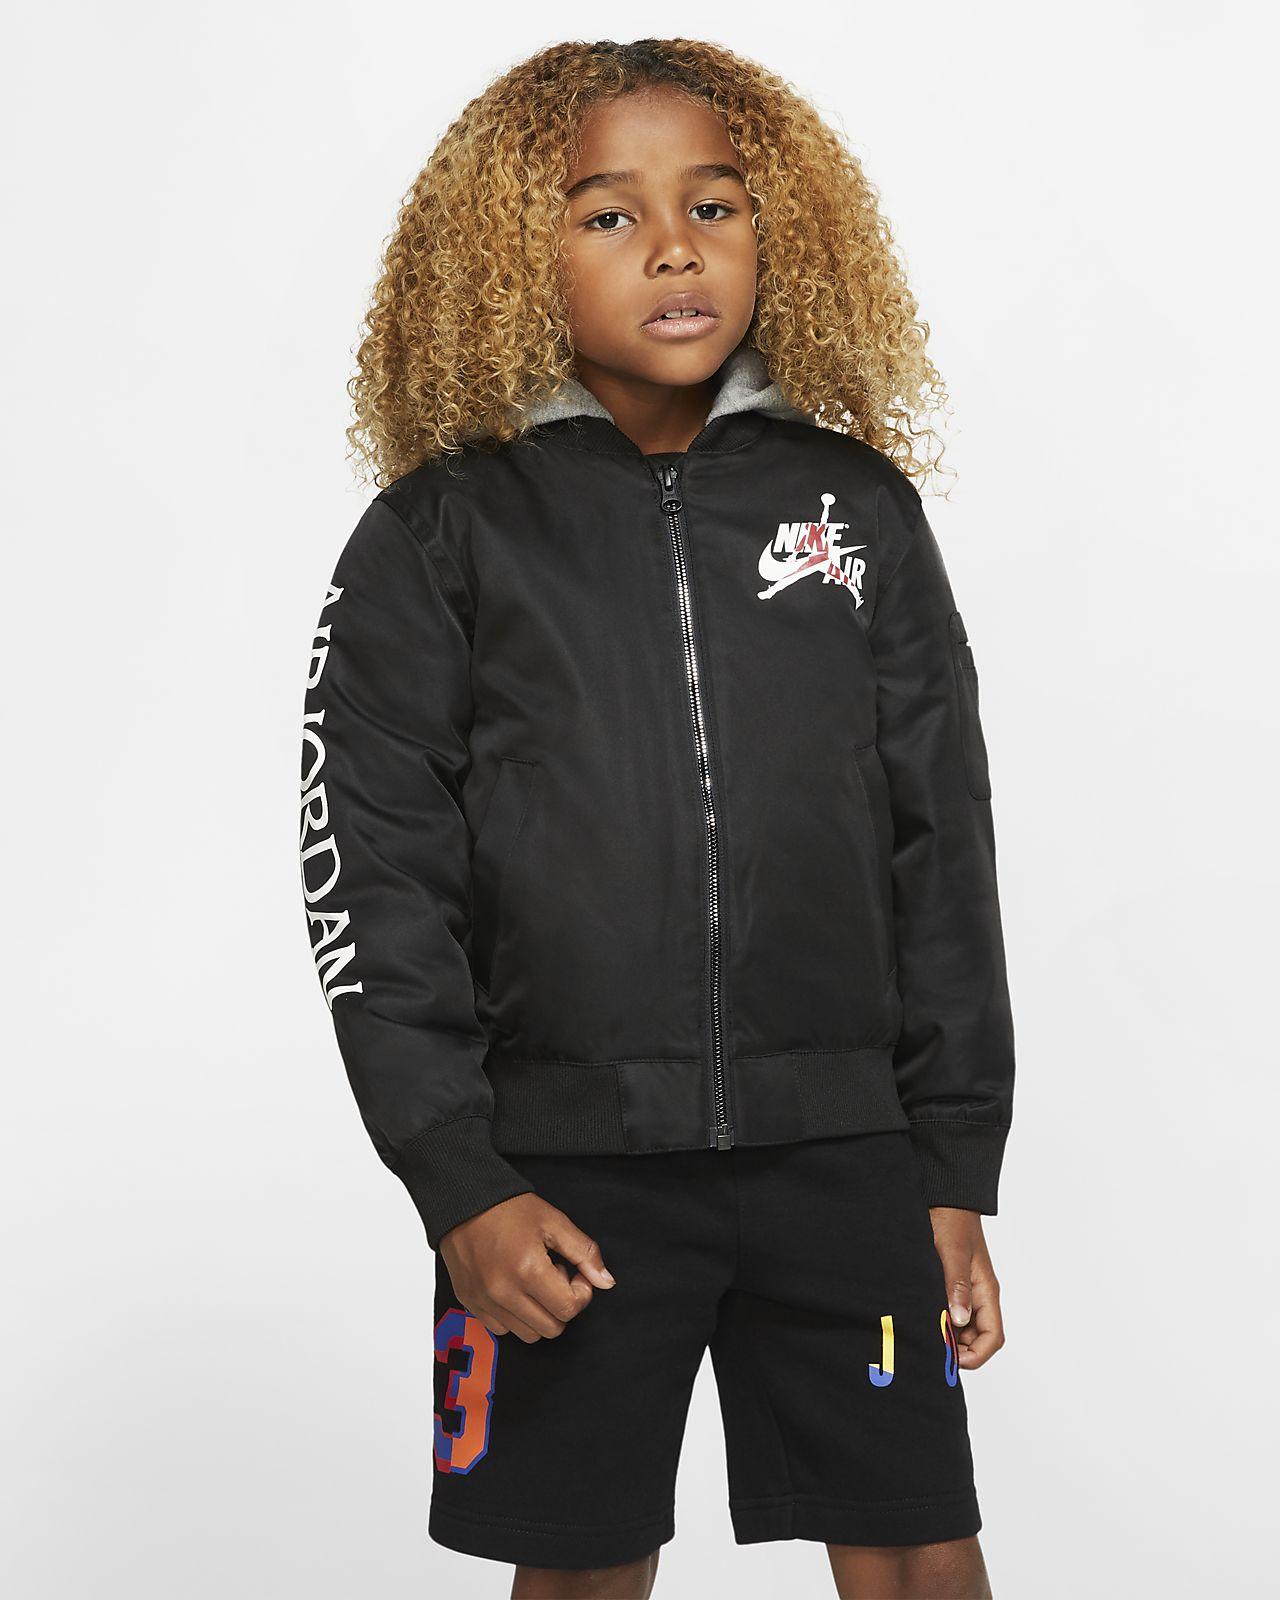 estilo moderno niño genuino mejor calificado Jordan Jumpman Chaqueta bomber con capucha - Niño/a pequeño/a